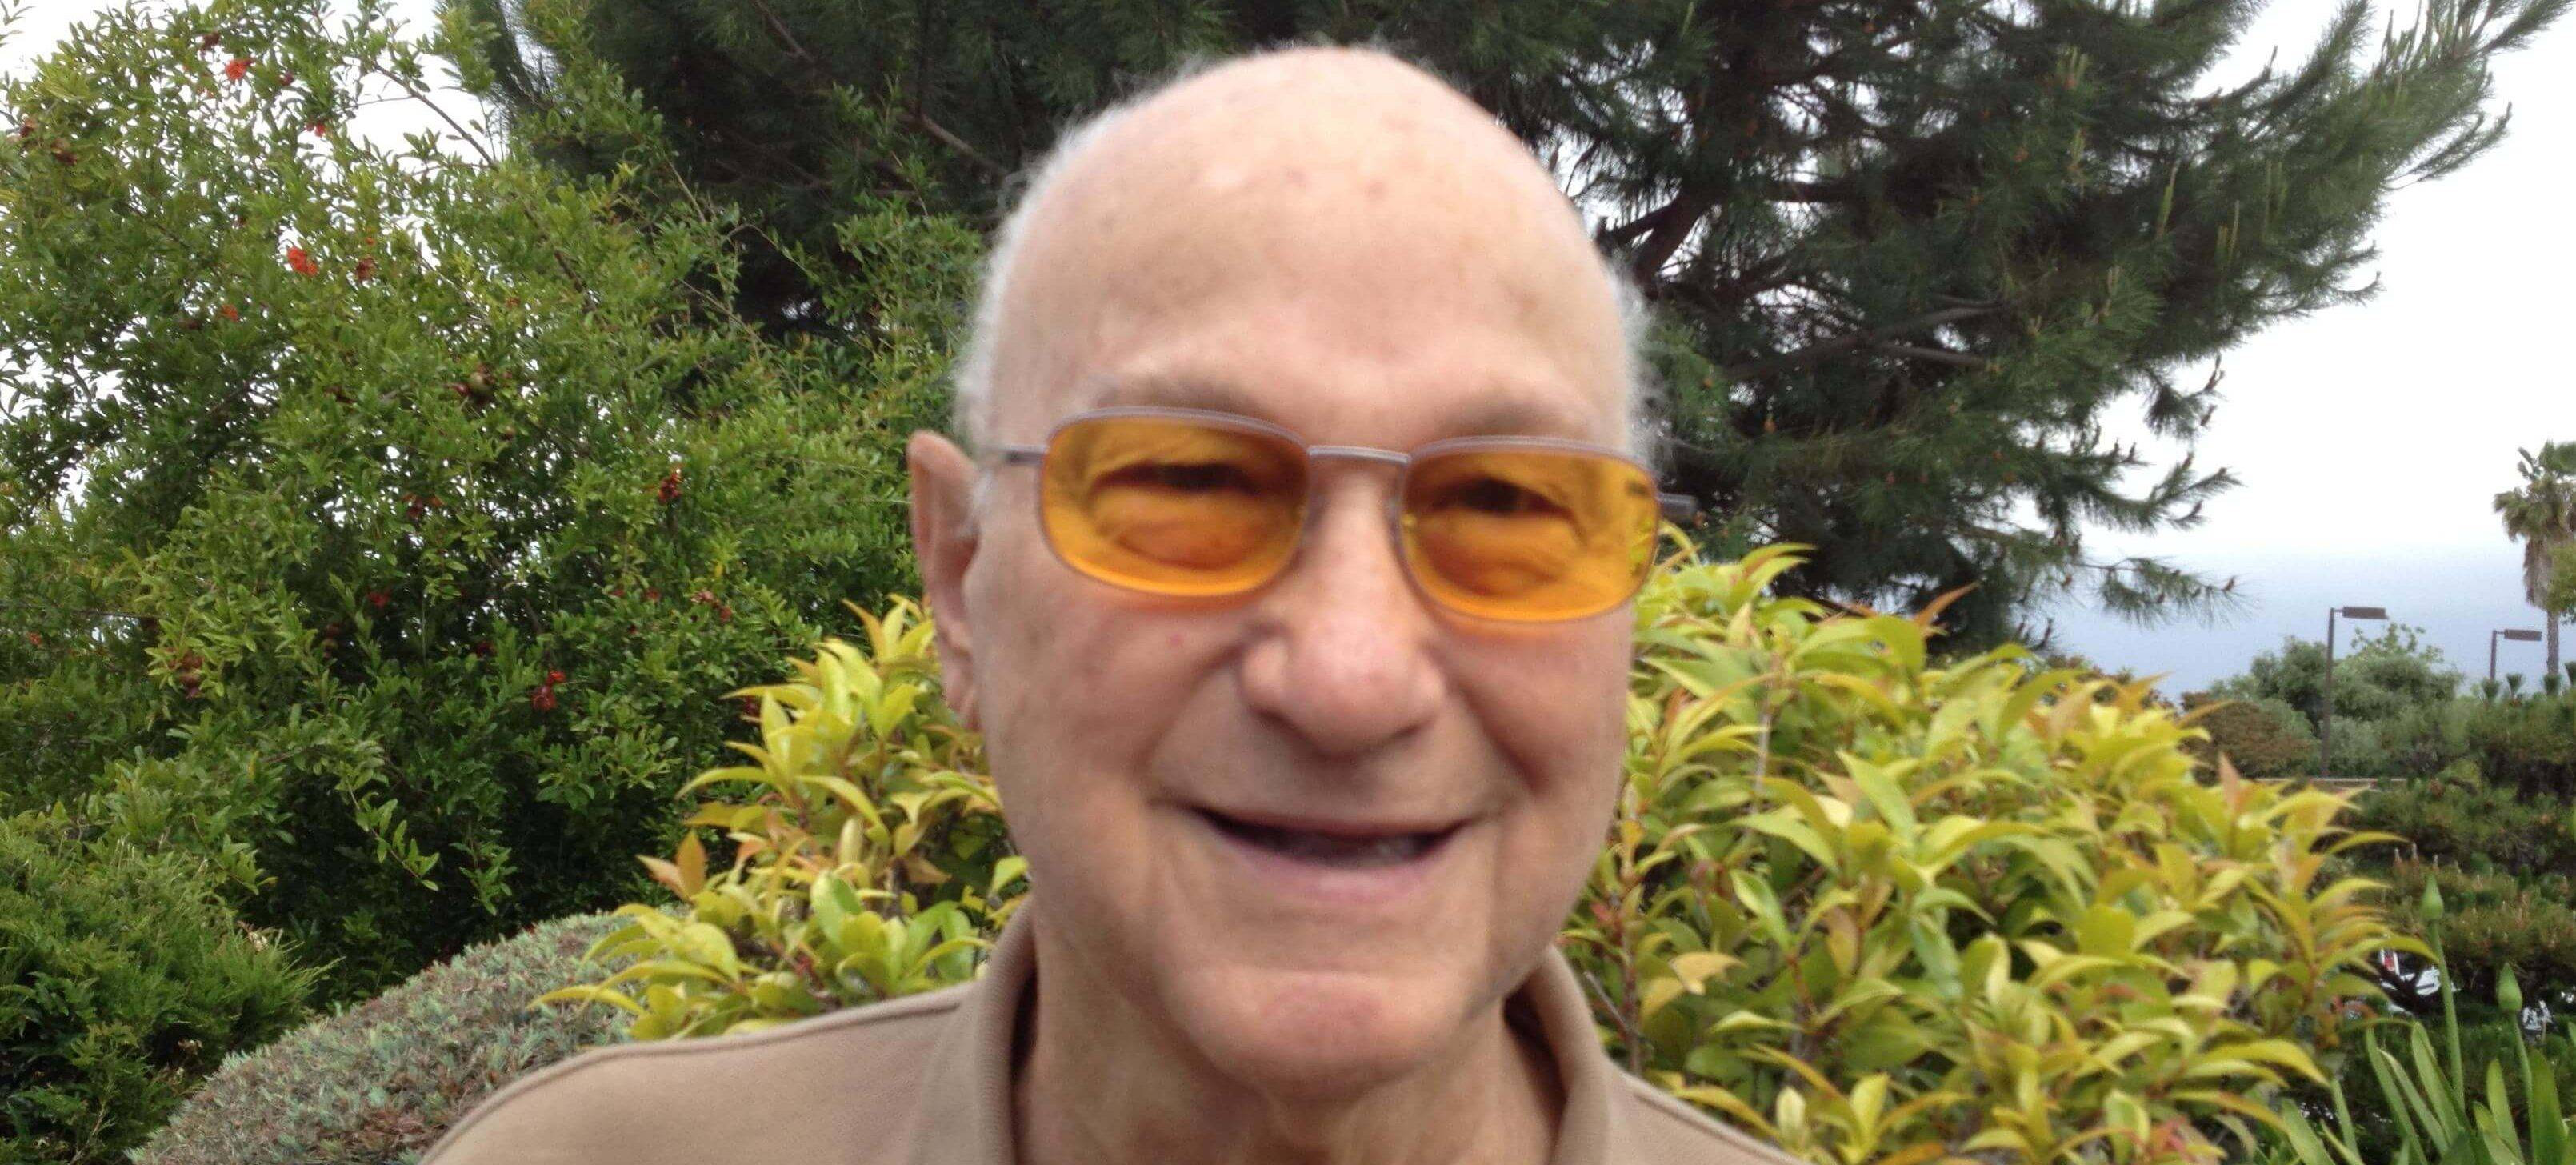 Senior wearing low vision glasses in Denver, CO